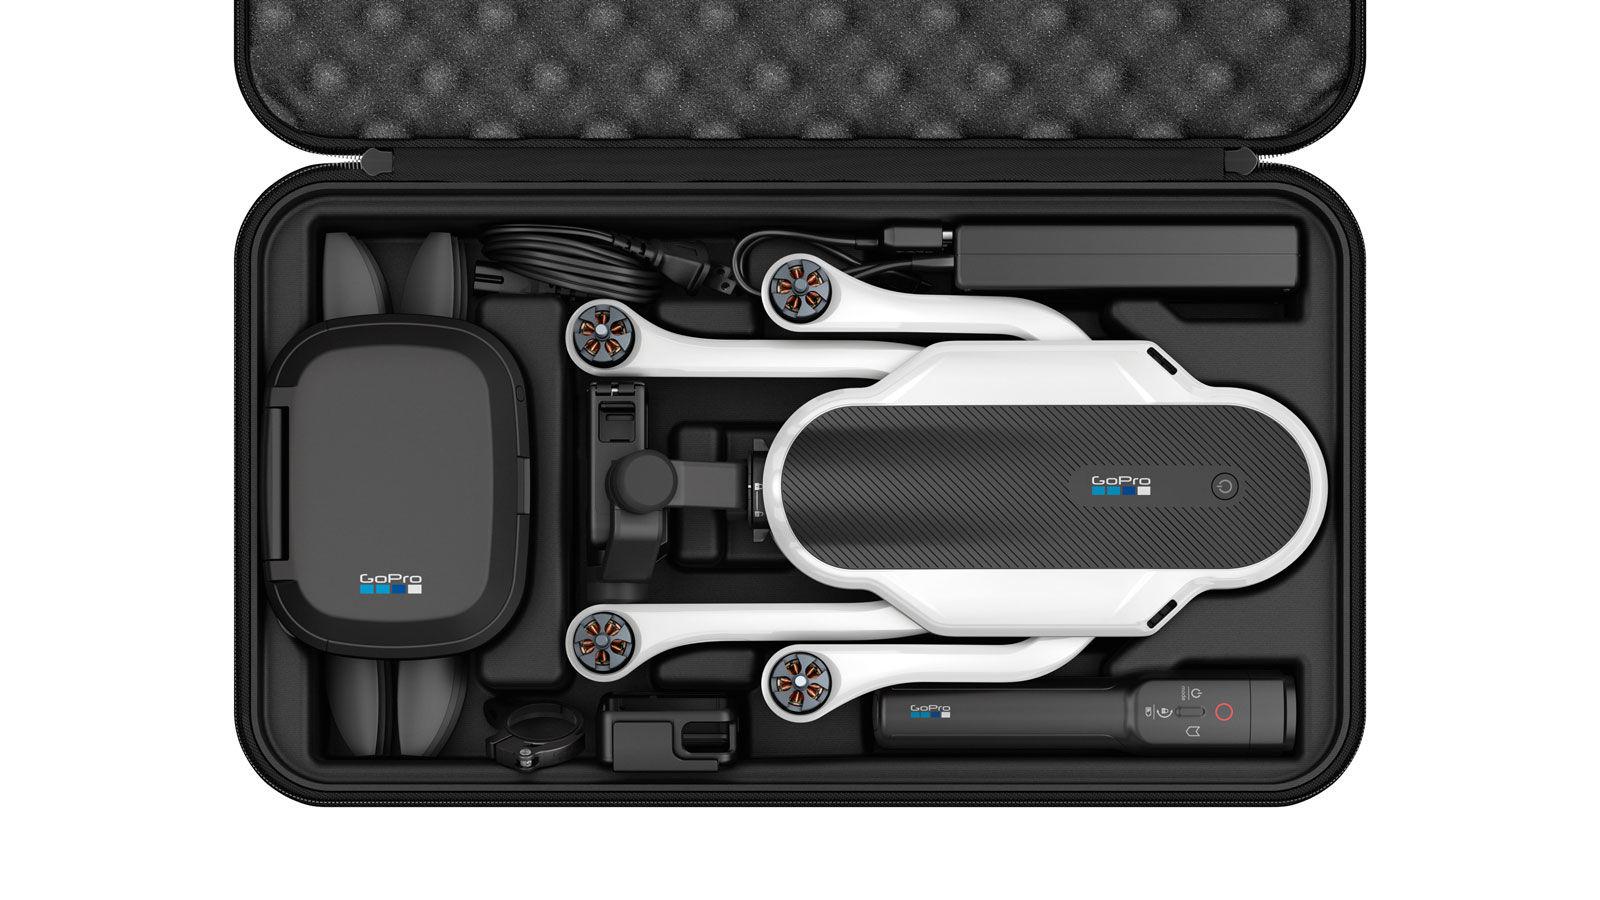 GoPro Karma  (QKWXX-601) – купить квадрокоптер, сравнение цен интернет-магазинов: фото, характеристики, описание | E-Katalog